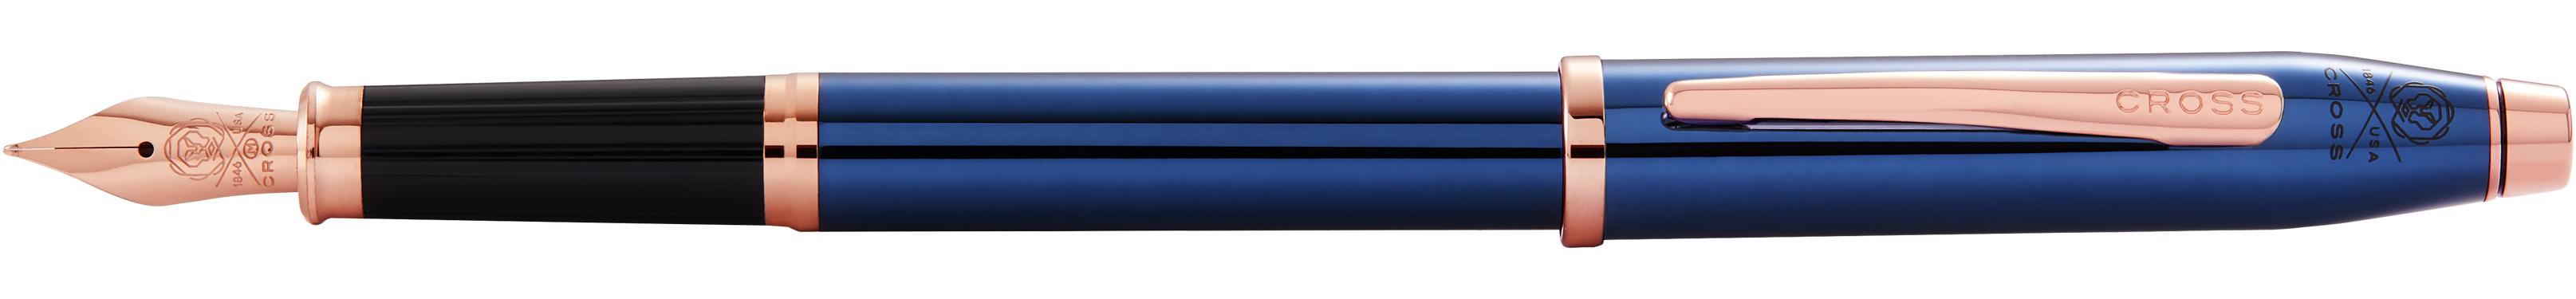 Century II Translucent Cobalt Blue Lacquer Fountain Pen